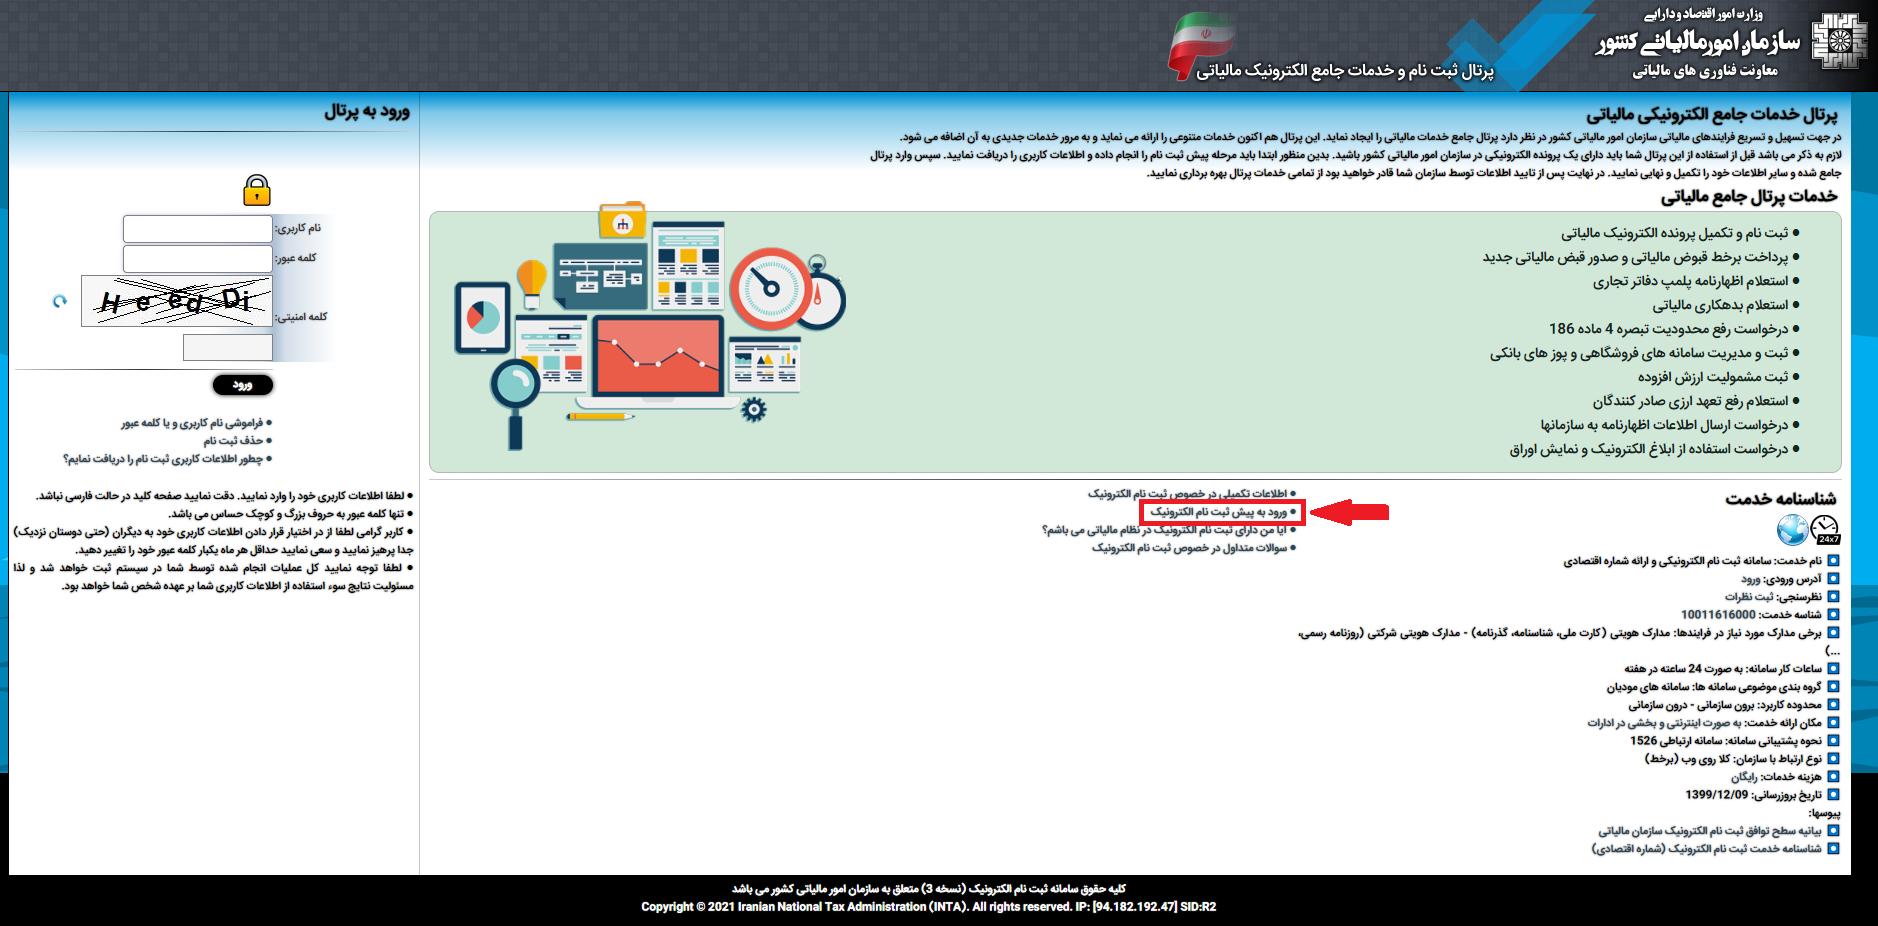 پیش ثبت نام الکترونیکی کد مالیاتی